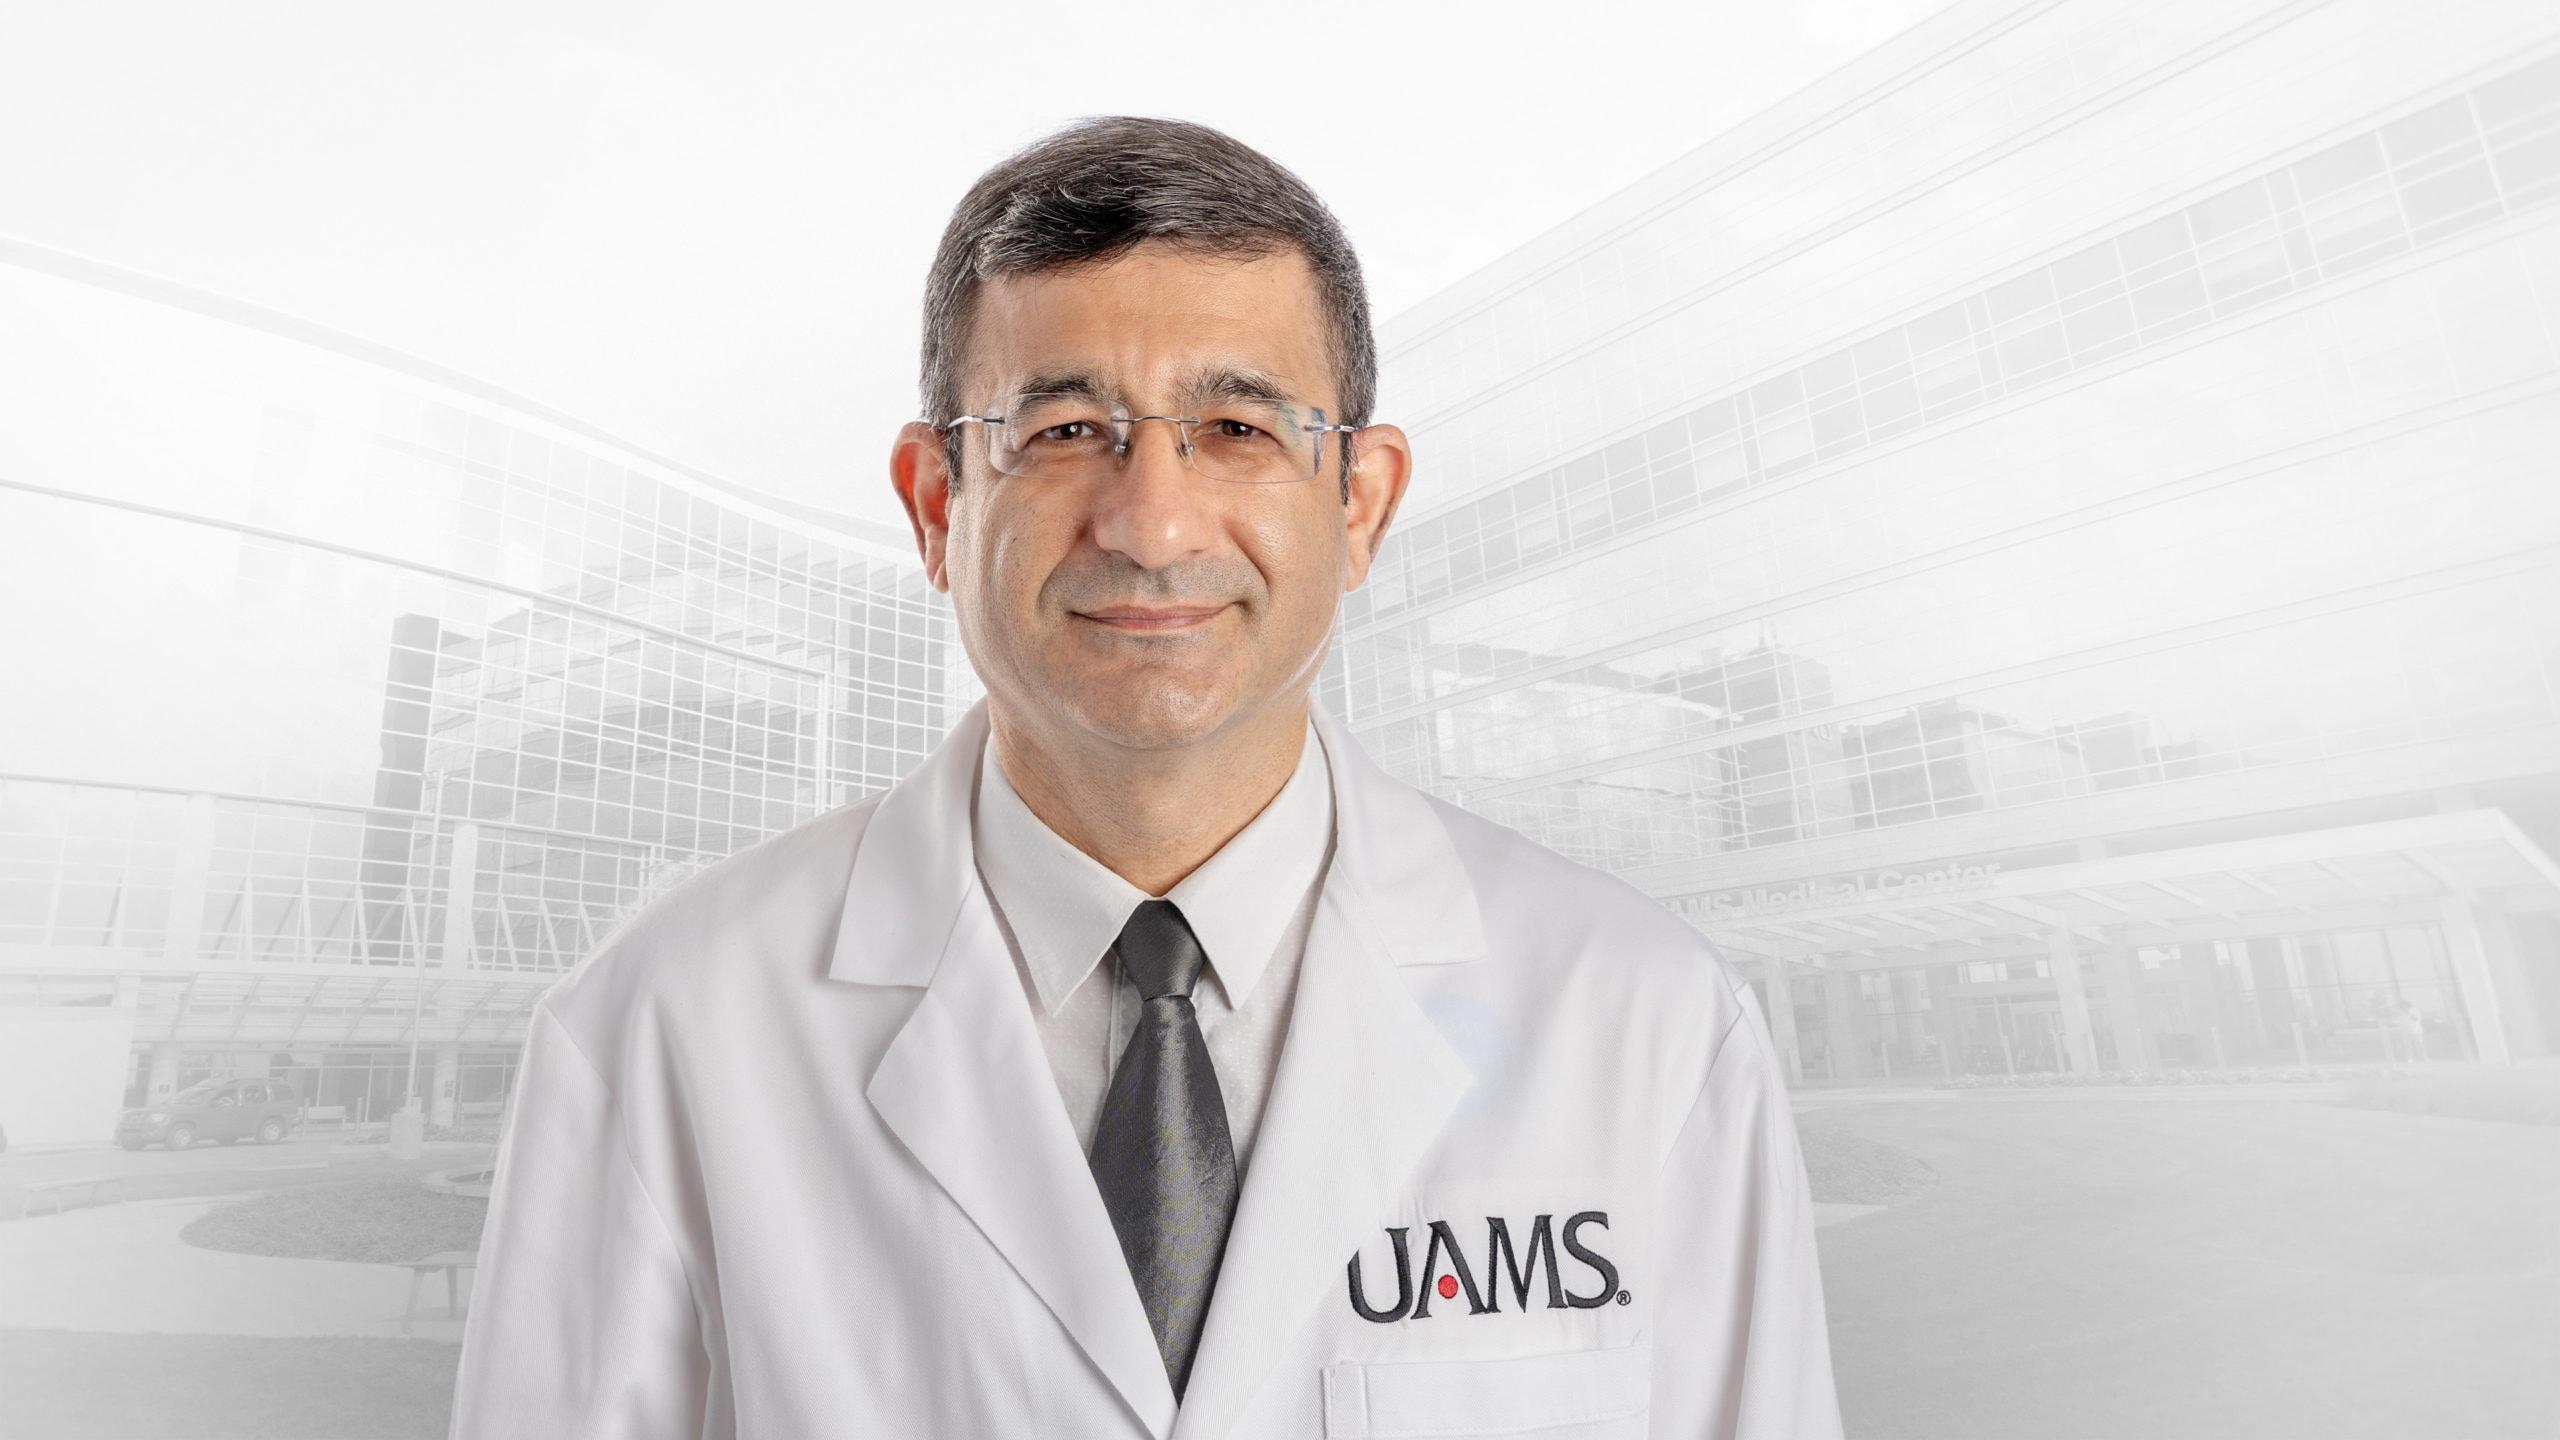 Alireza Ghaffarieh, M.D.